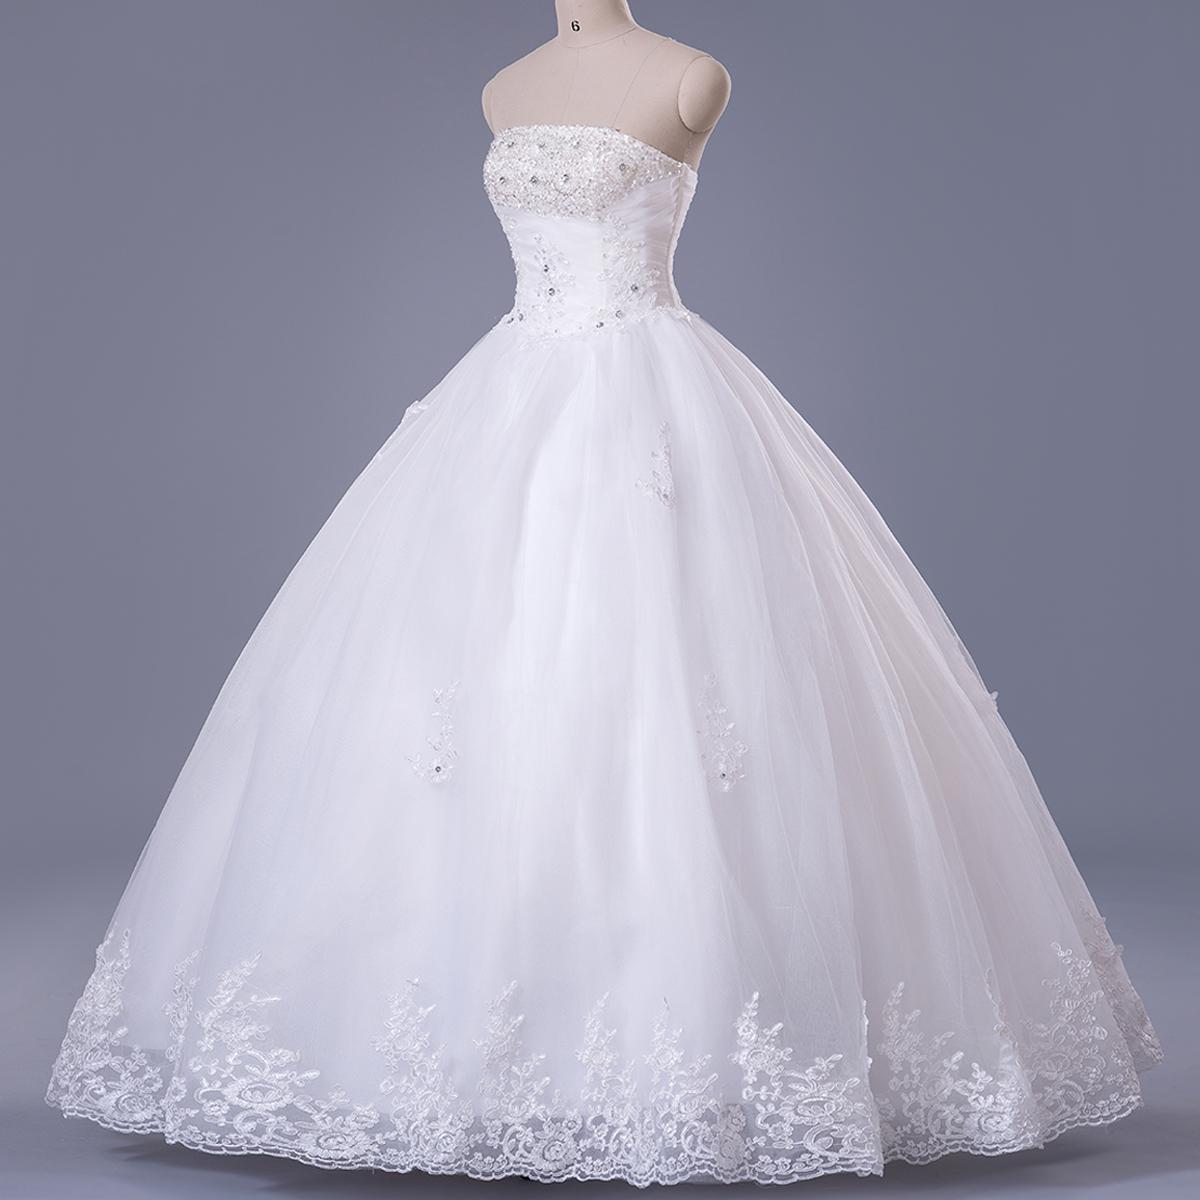 Hot designer 50 off lace wedding dresses 2015 strapless a for Sexy wedding dress designers